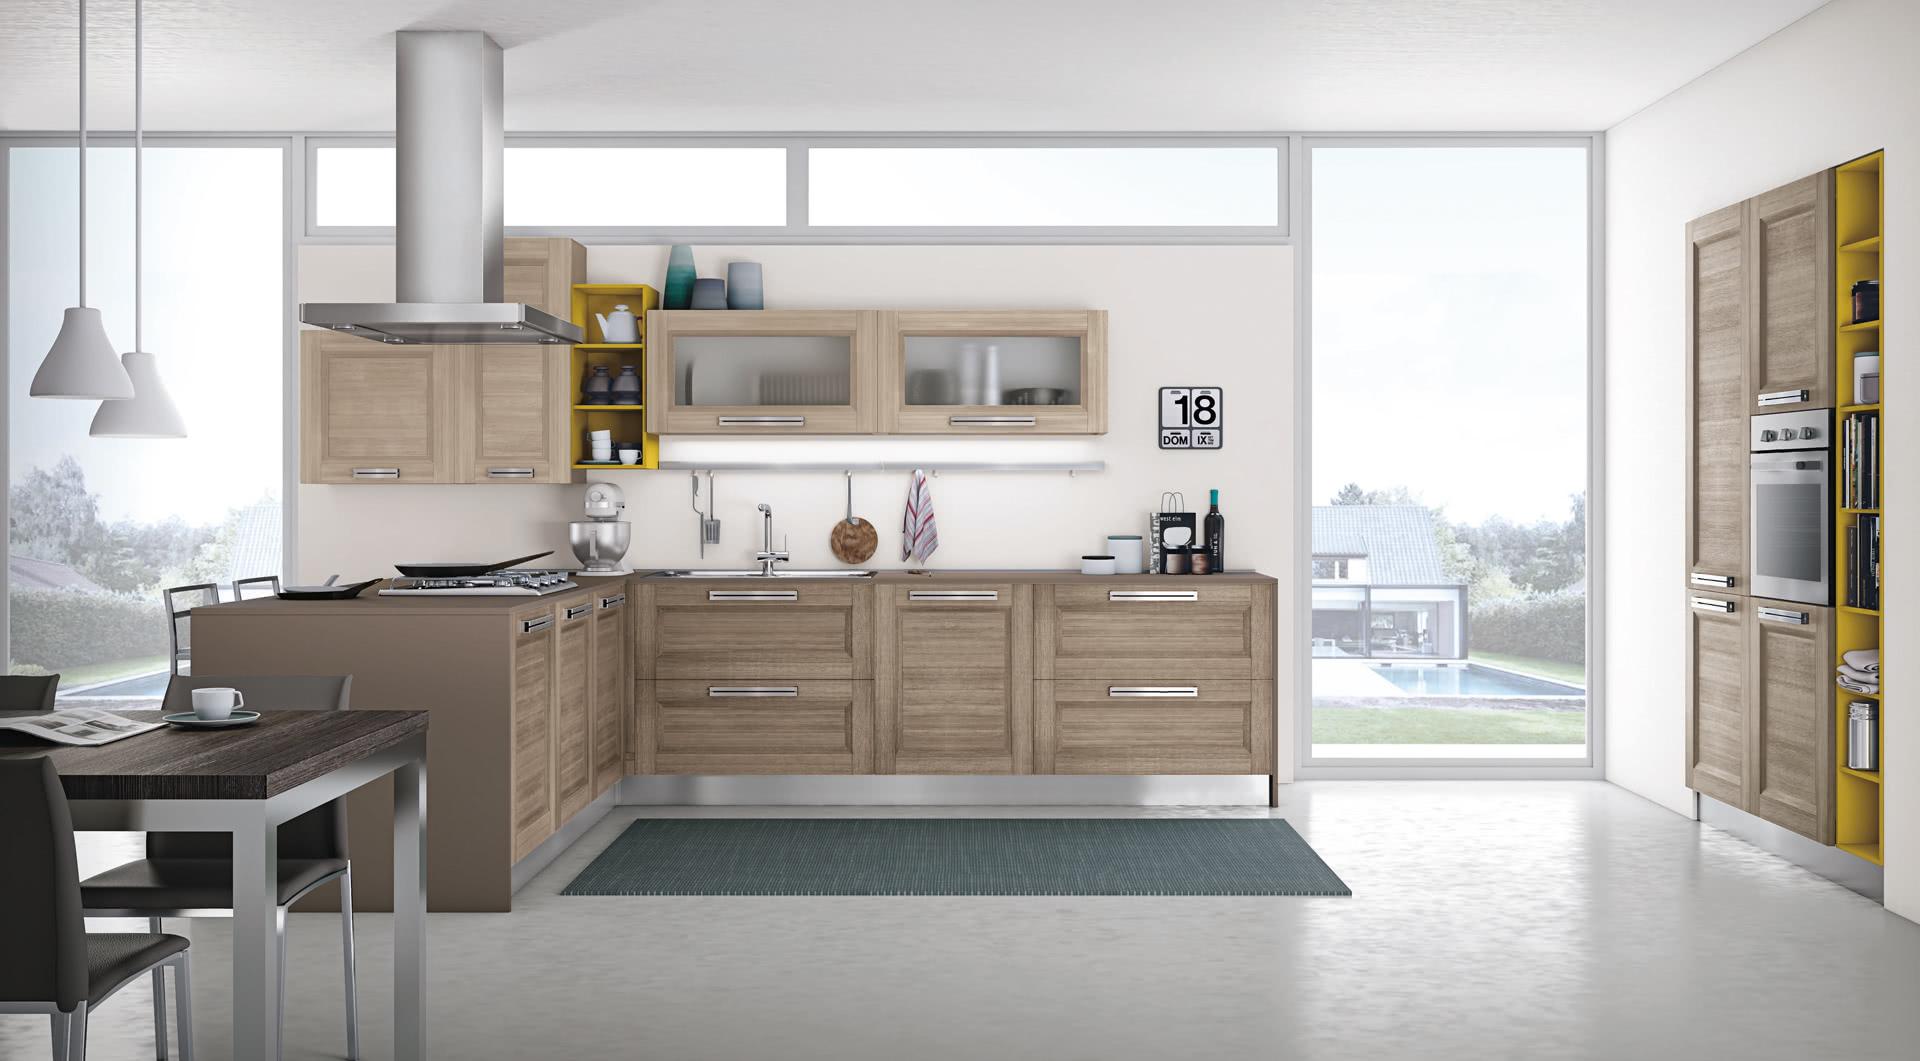 Cucine Creo Lube Opinioni cucina moderna lube - mya creo kitchens